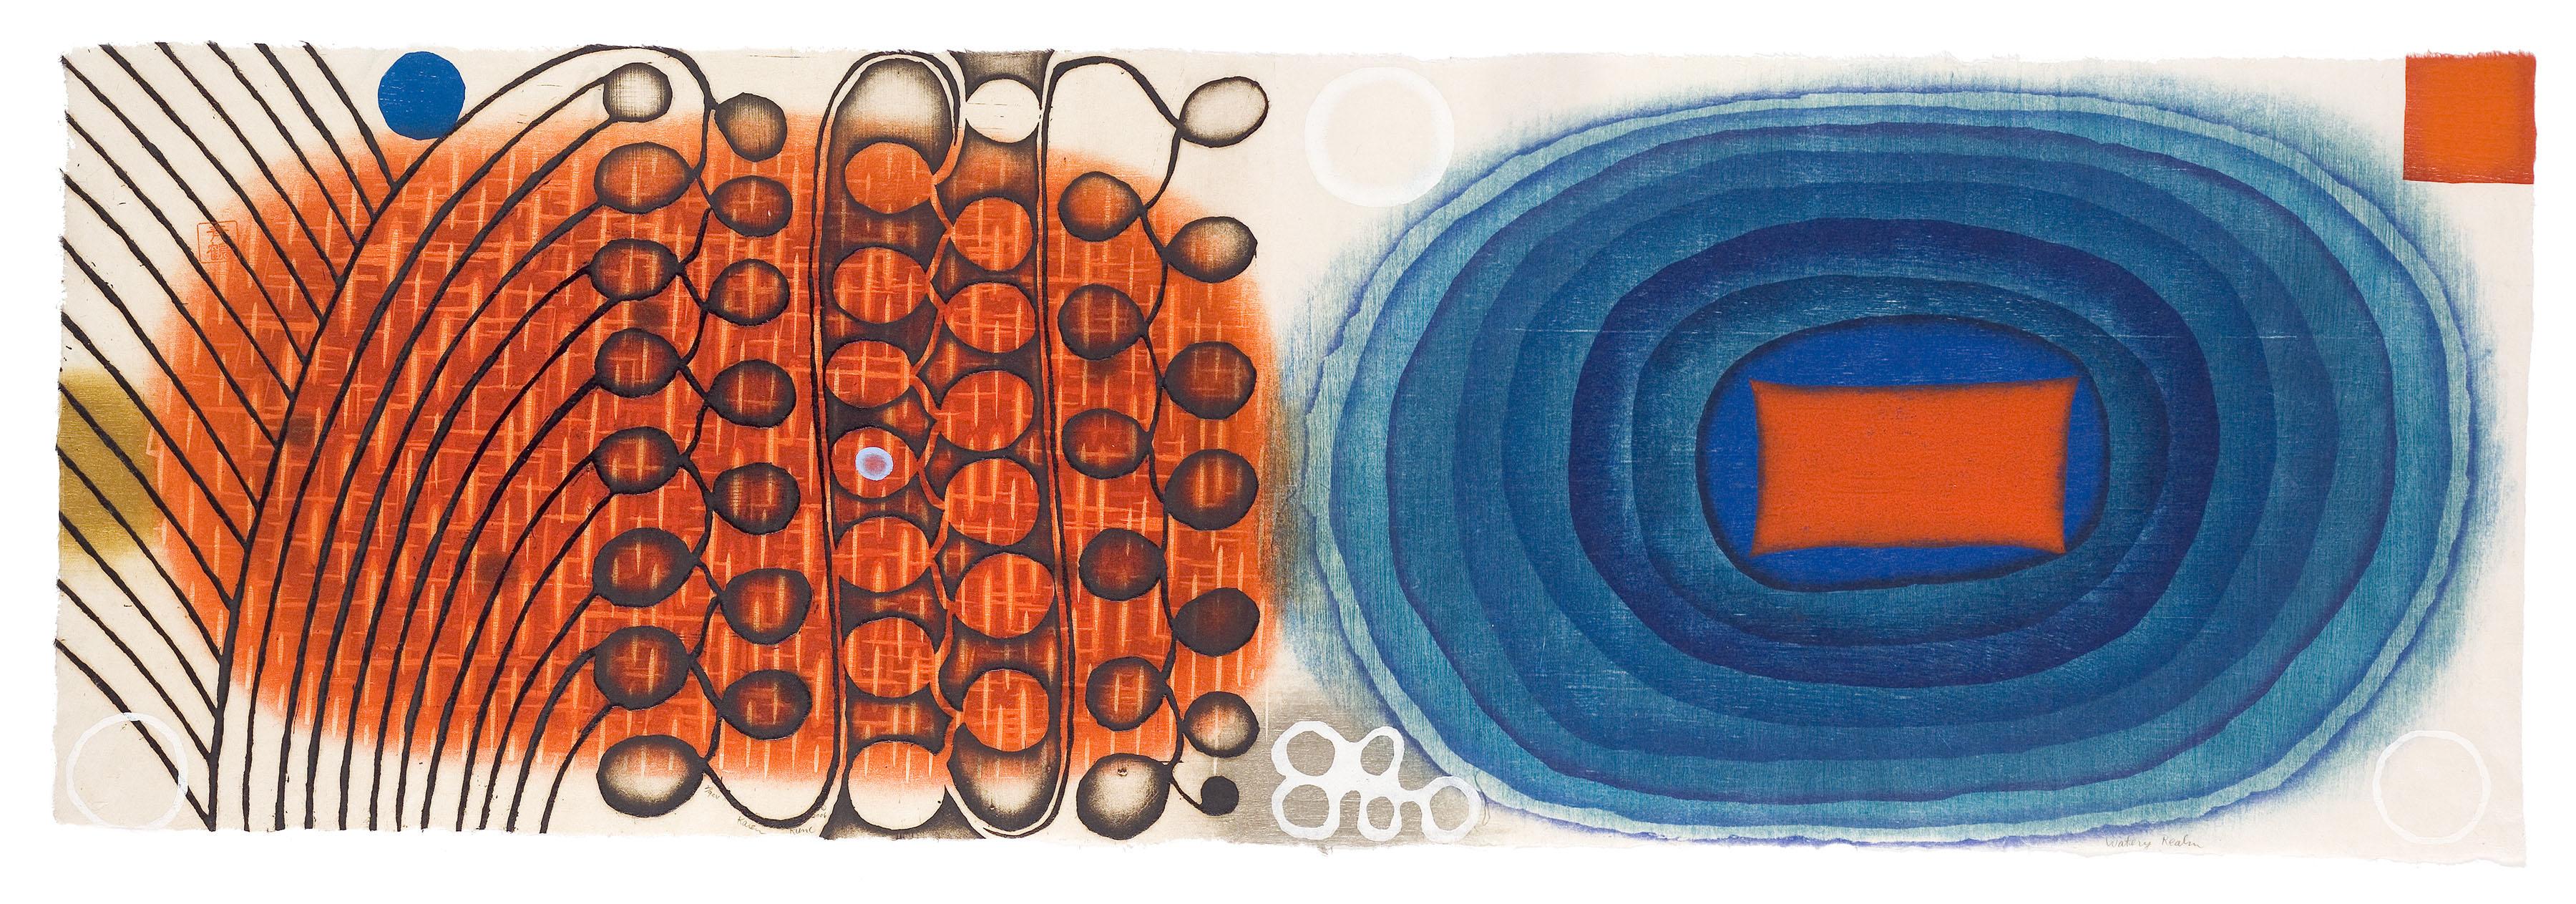 "Artwork by Karen Kunc: ""Watery Realm,"" 2006, woodcut & etching, 11.5"" x 36"""